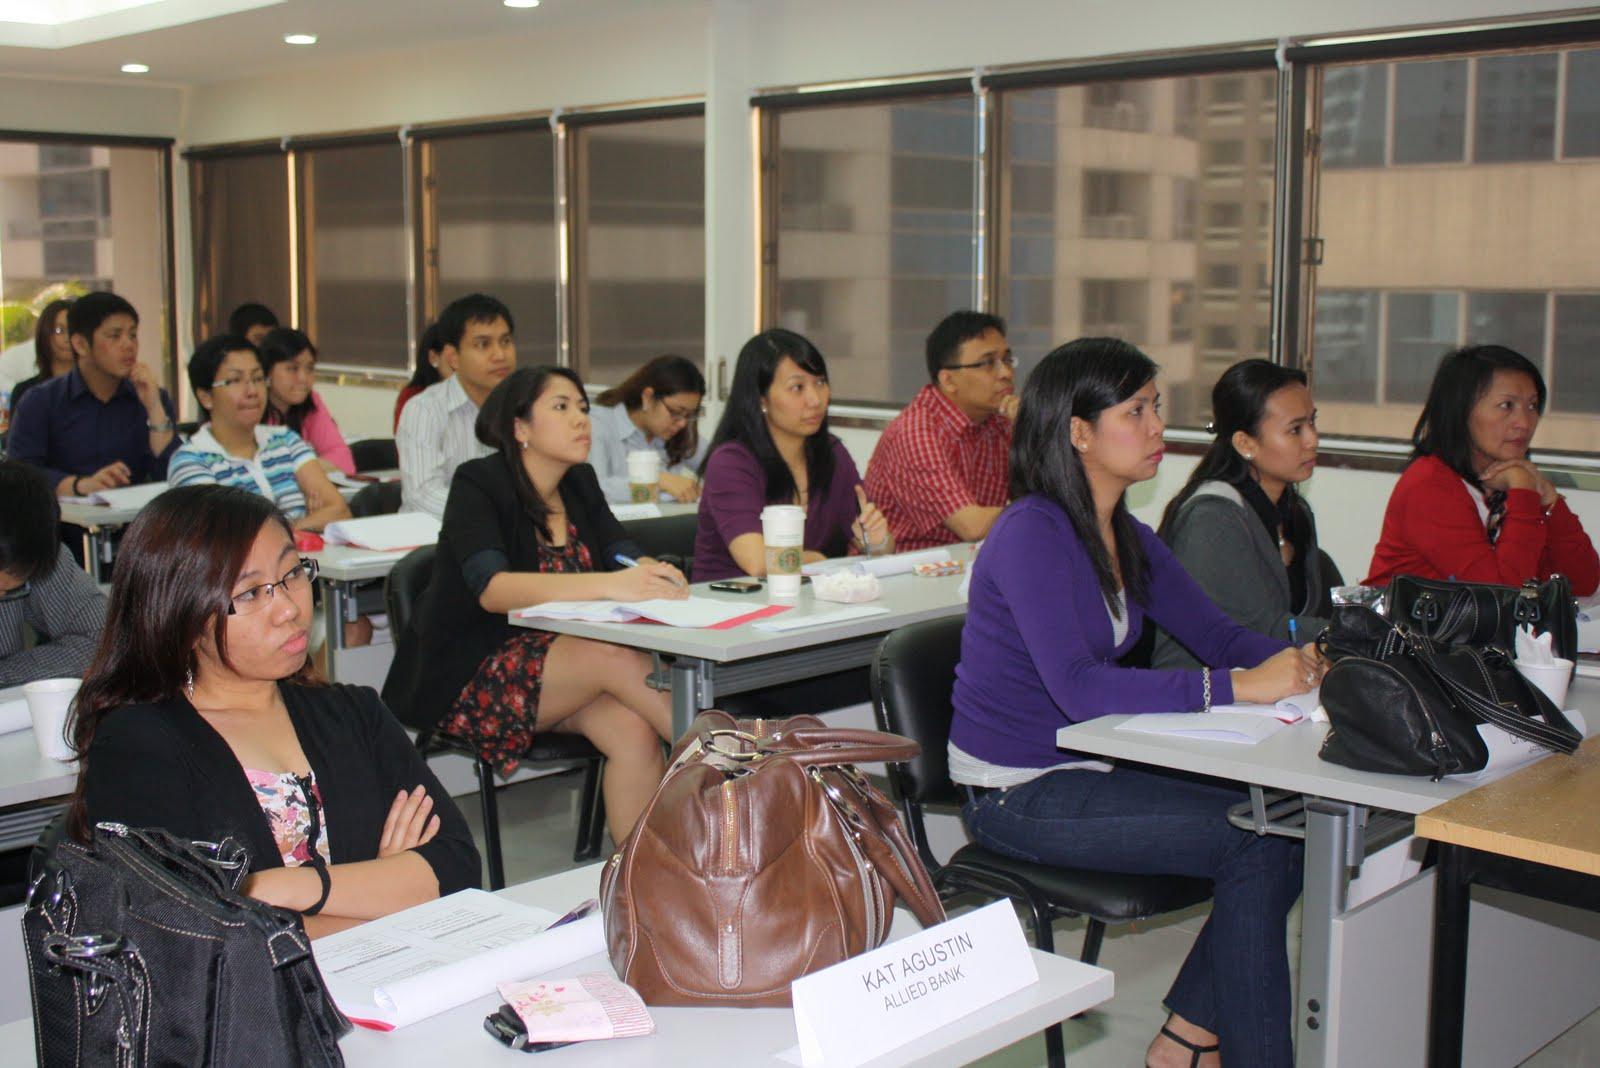 Technical Analysis Seminar - February 25, 2011 (Trainintg Room, ACI-MART Office)